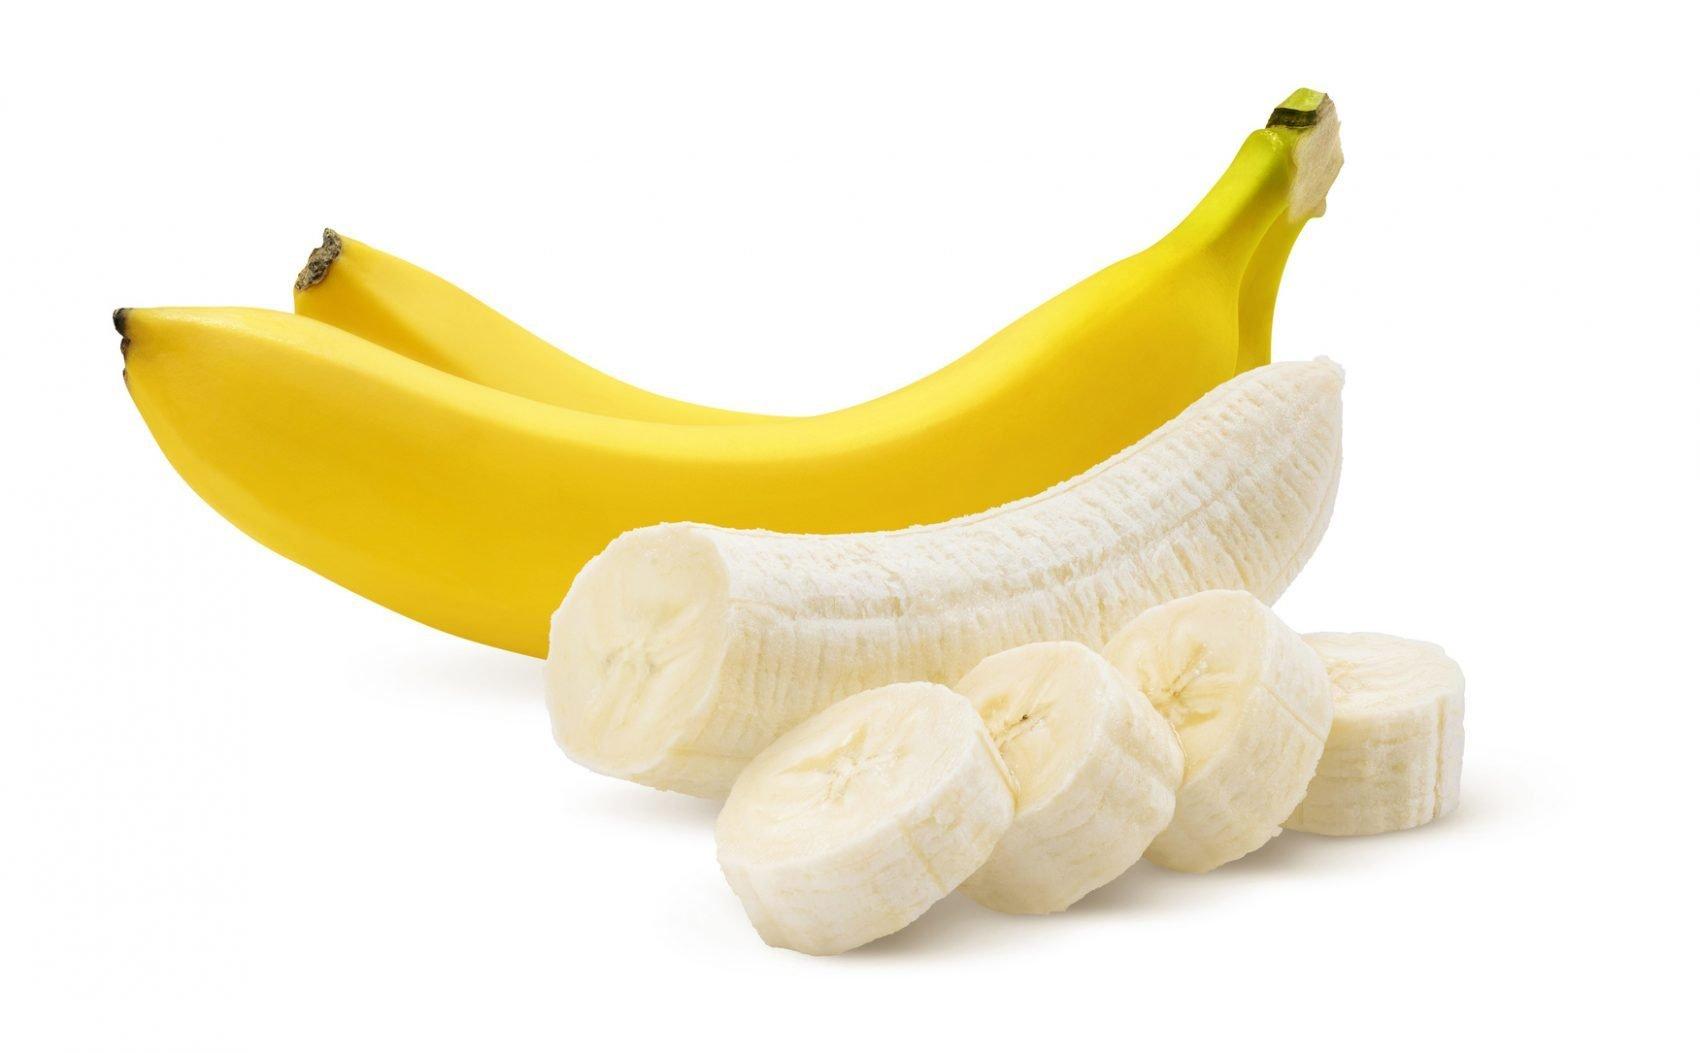 banane intere e banana a fette per caramelle artigianali terranova siciliane made in italy